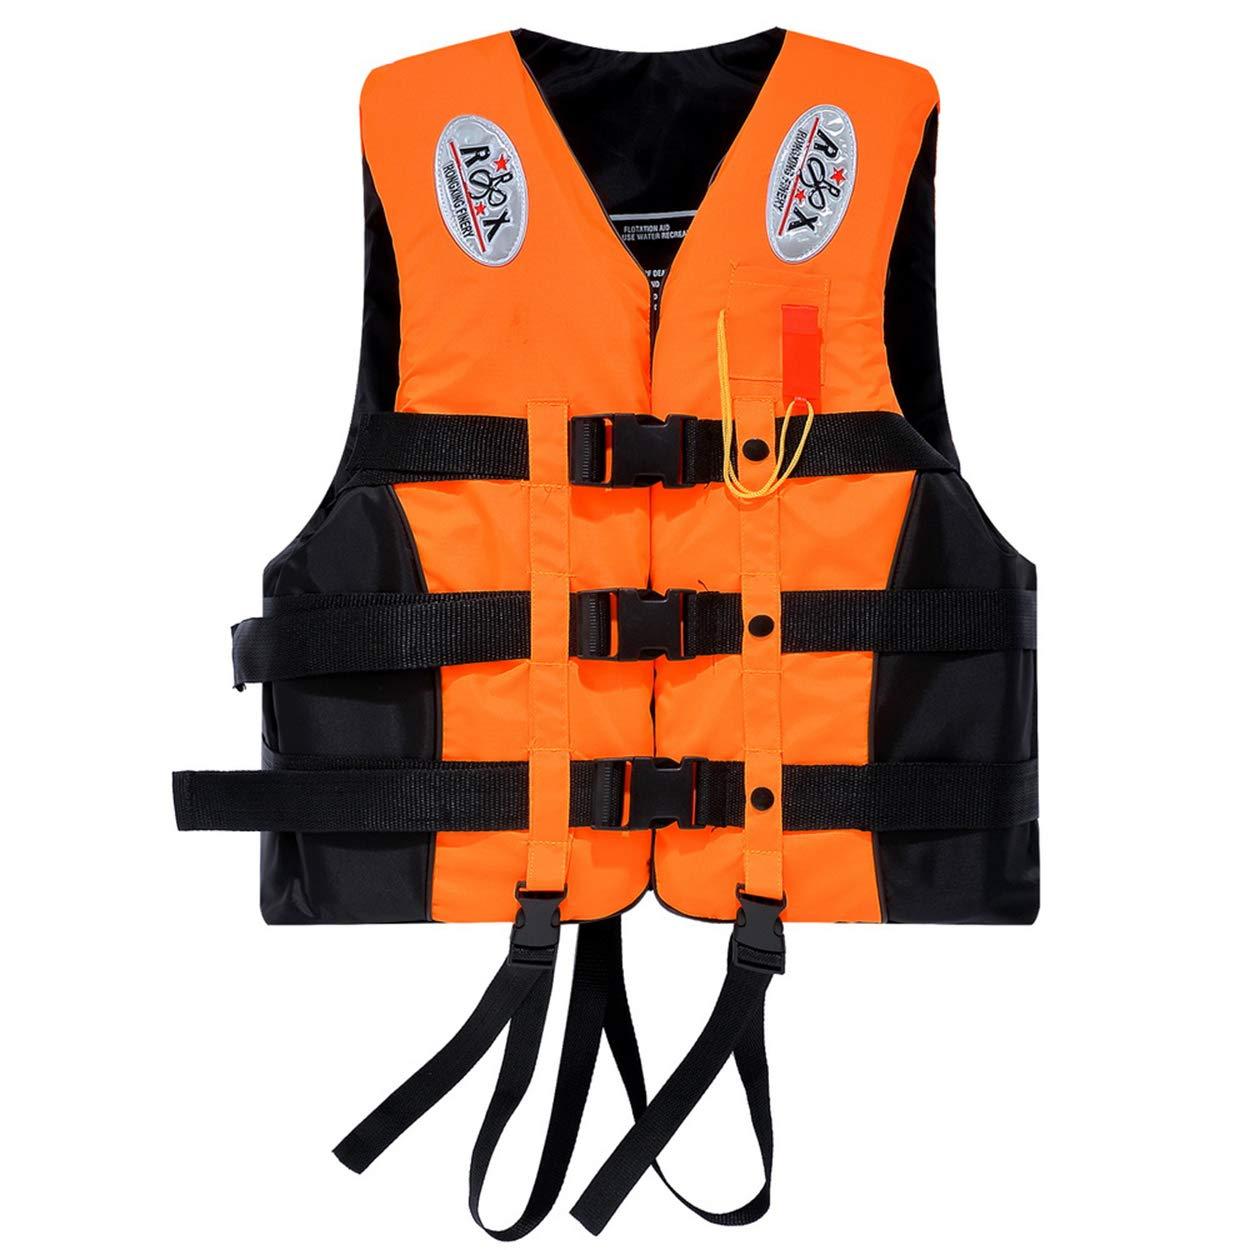 Xy Litol ライフジャケット 大人用 カヤック プリザーバー ベスト XXX-Large(fit weight 176 -221 lbs) オレンジ B07HMVZB9B